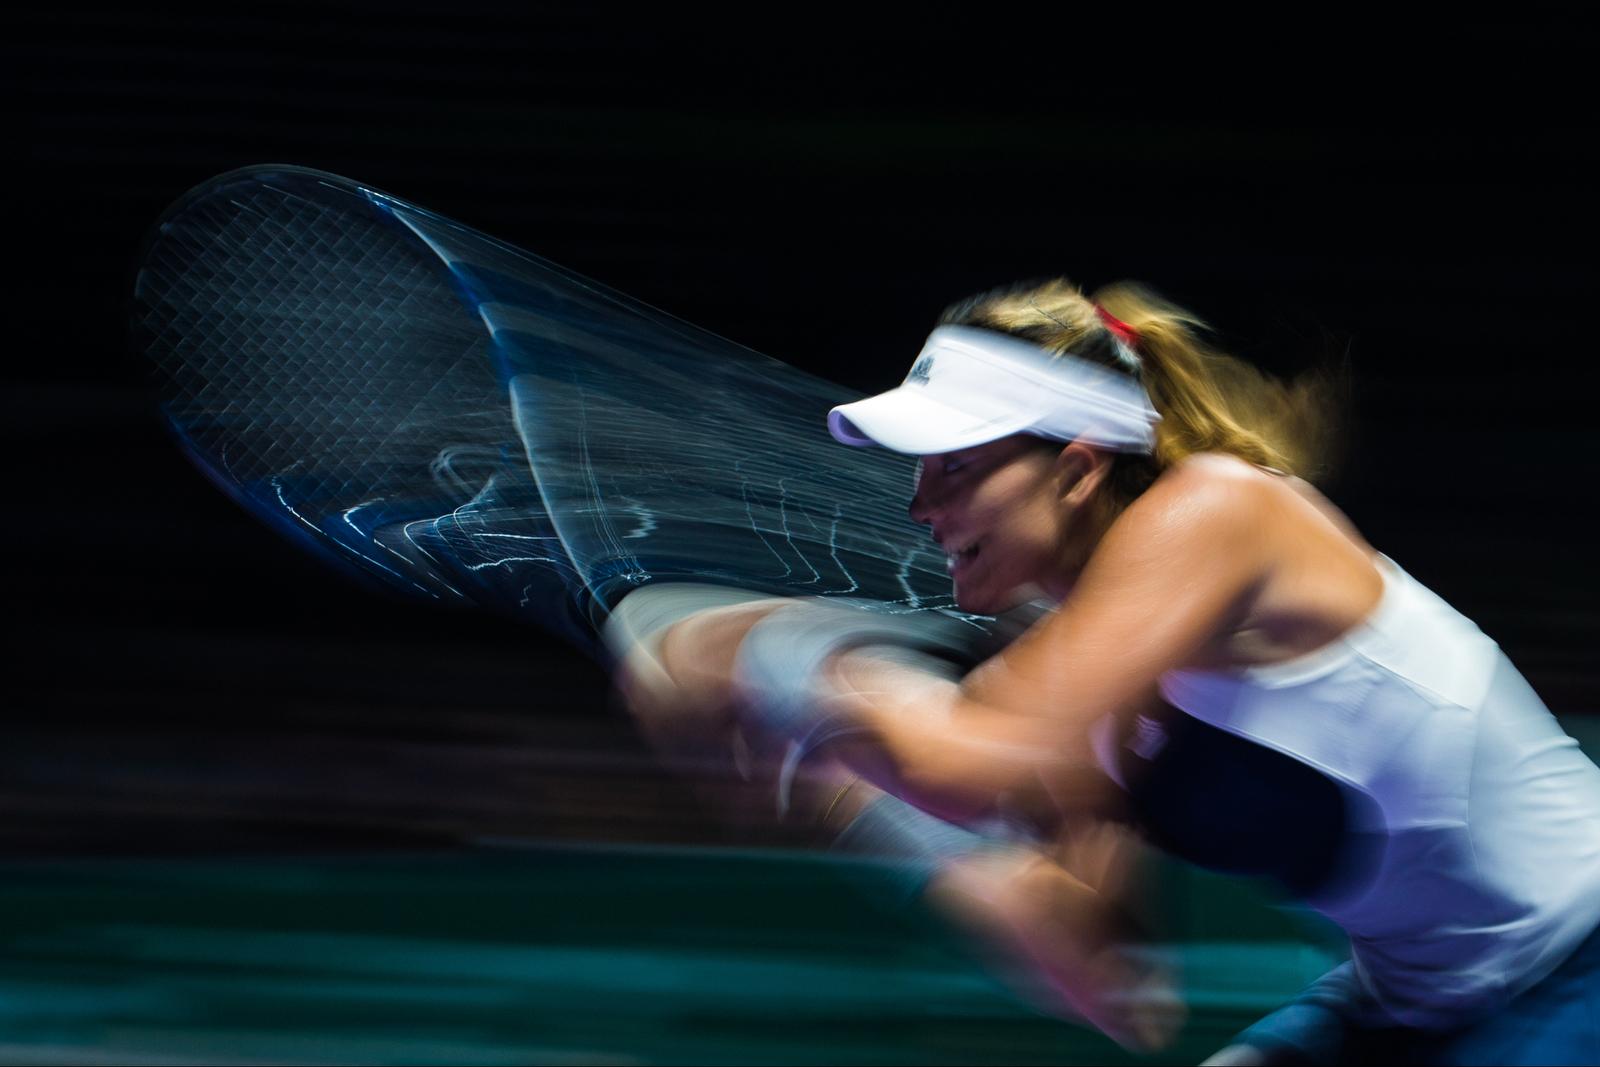 Garbine Muguruza of Spain in action against Agnieszka Radwanska of Poland during their singles semi-final match during the BNP Paribas WTA Finals at the Singapore Indoor Stadium on October 31, 2015 in Singapore.